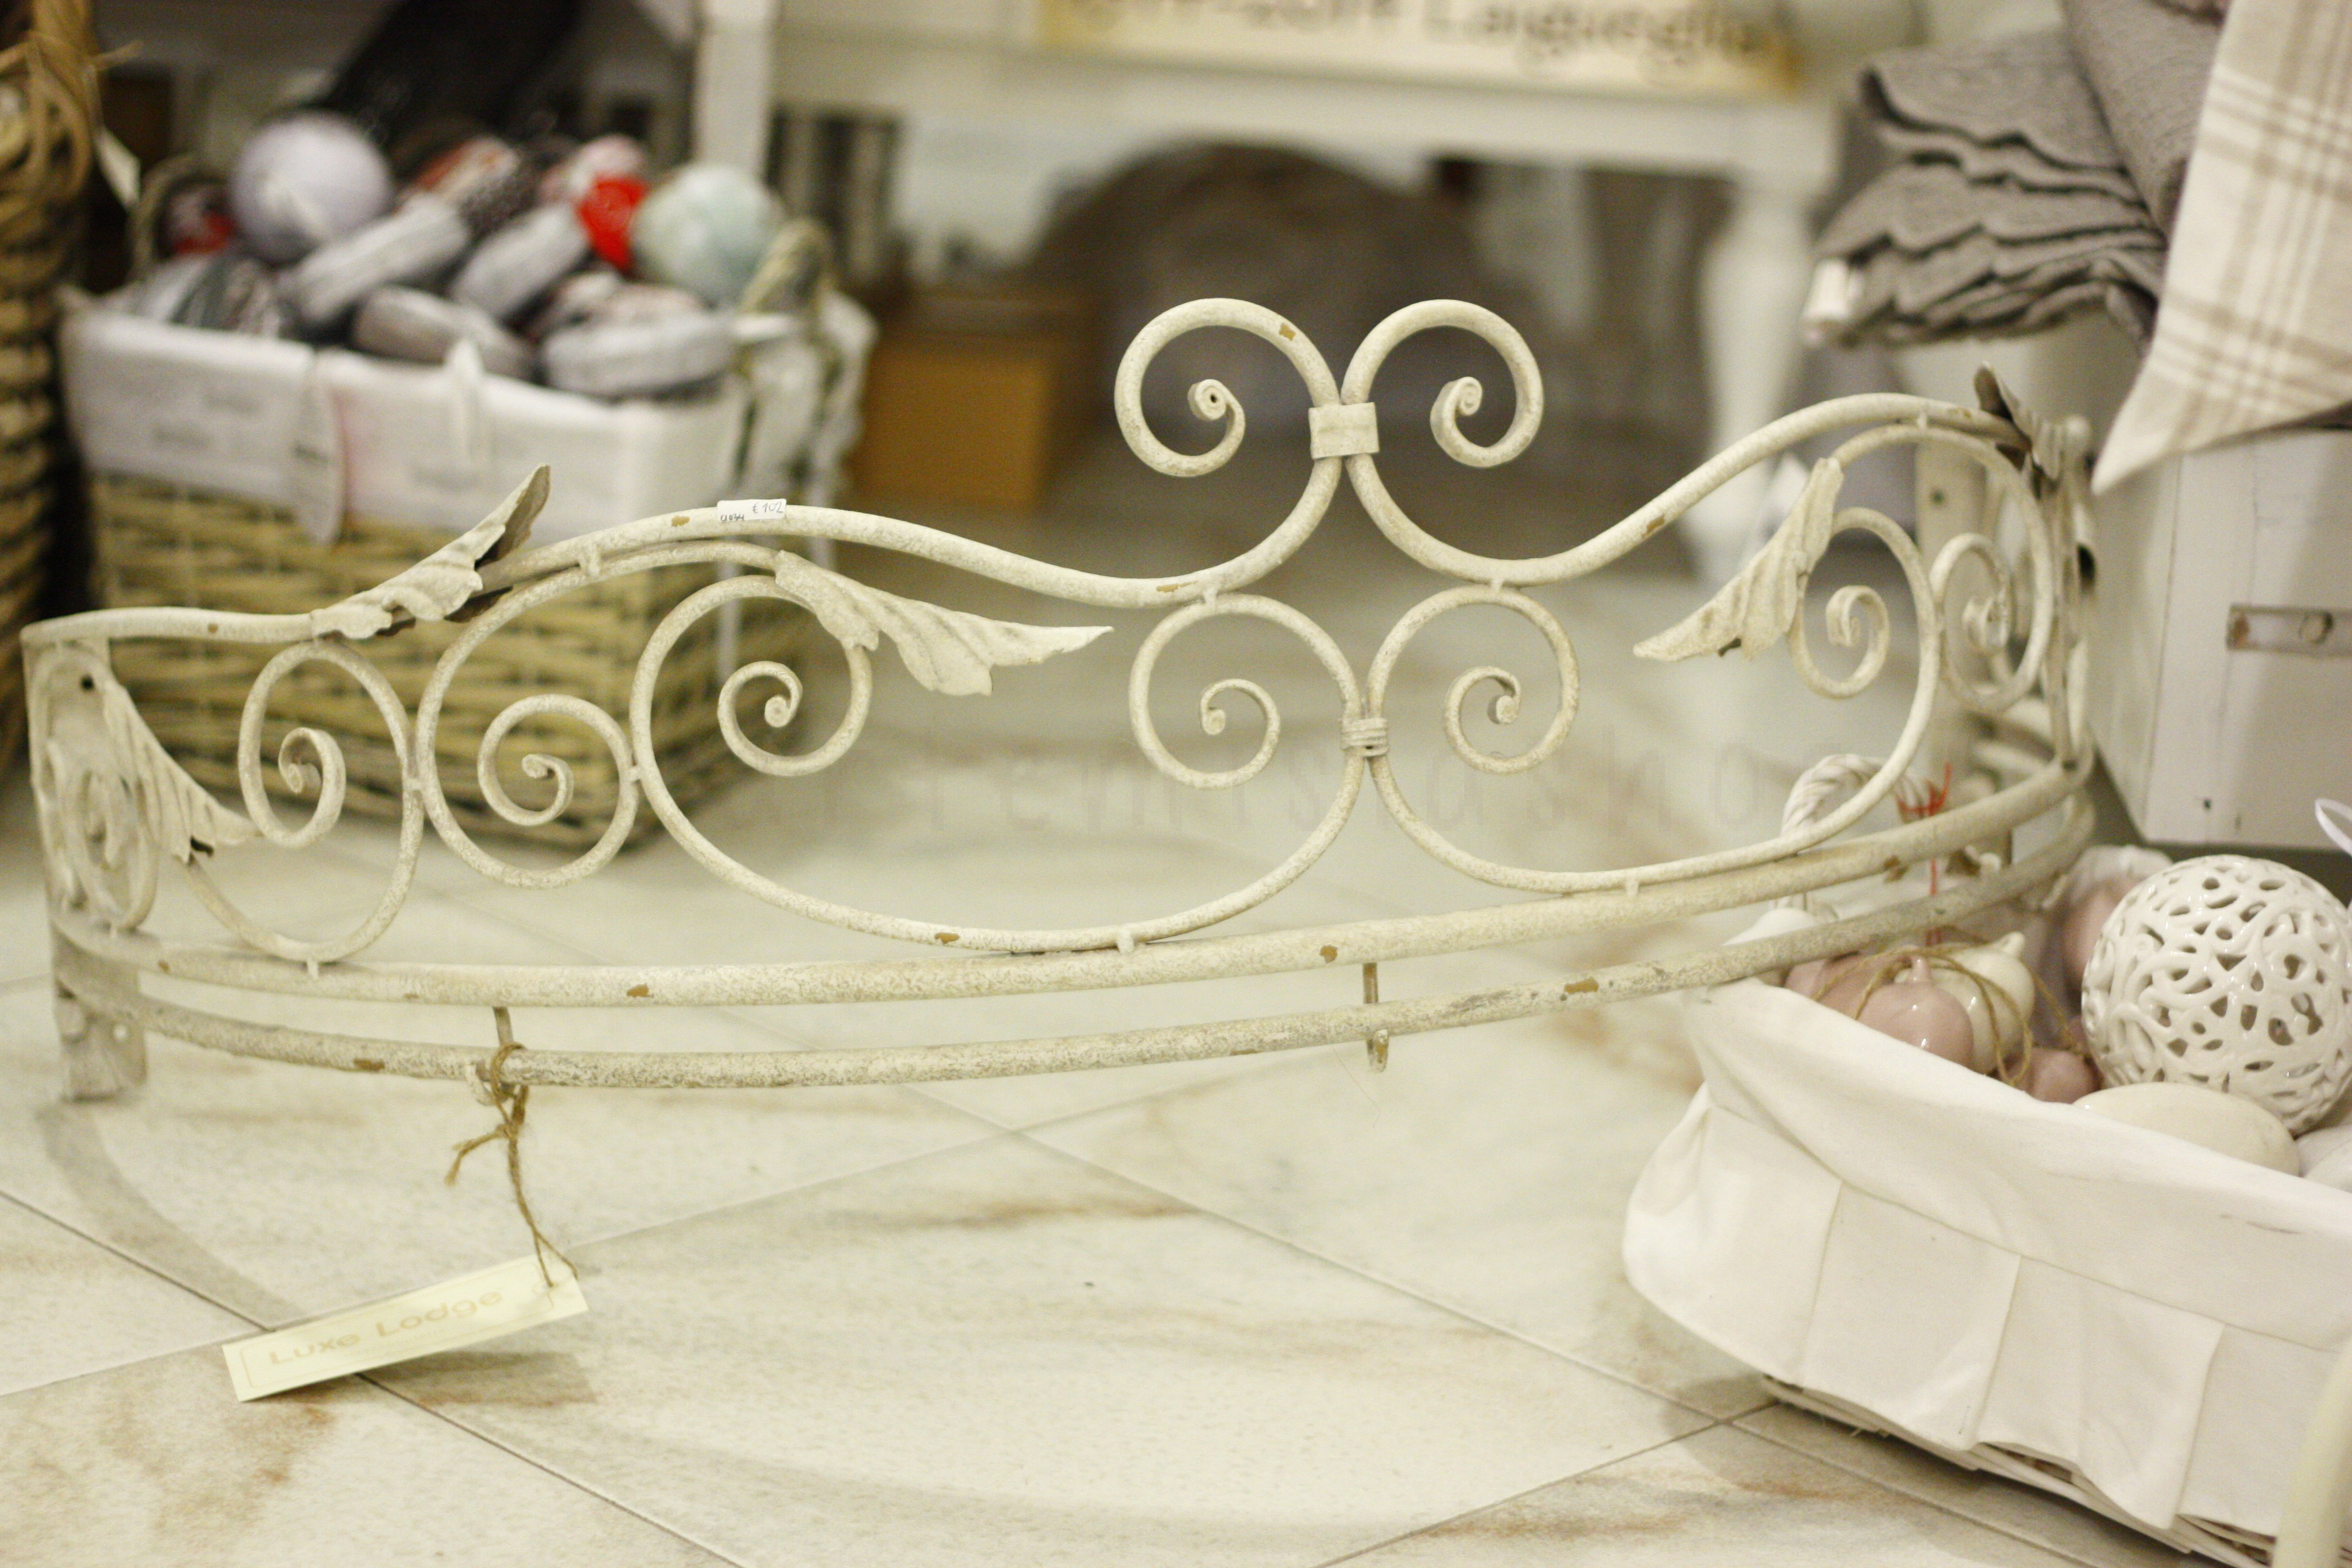 Ciel de lit vendita on line pannelli termoisolanti for Vendita on line design